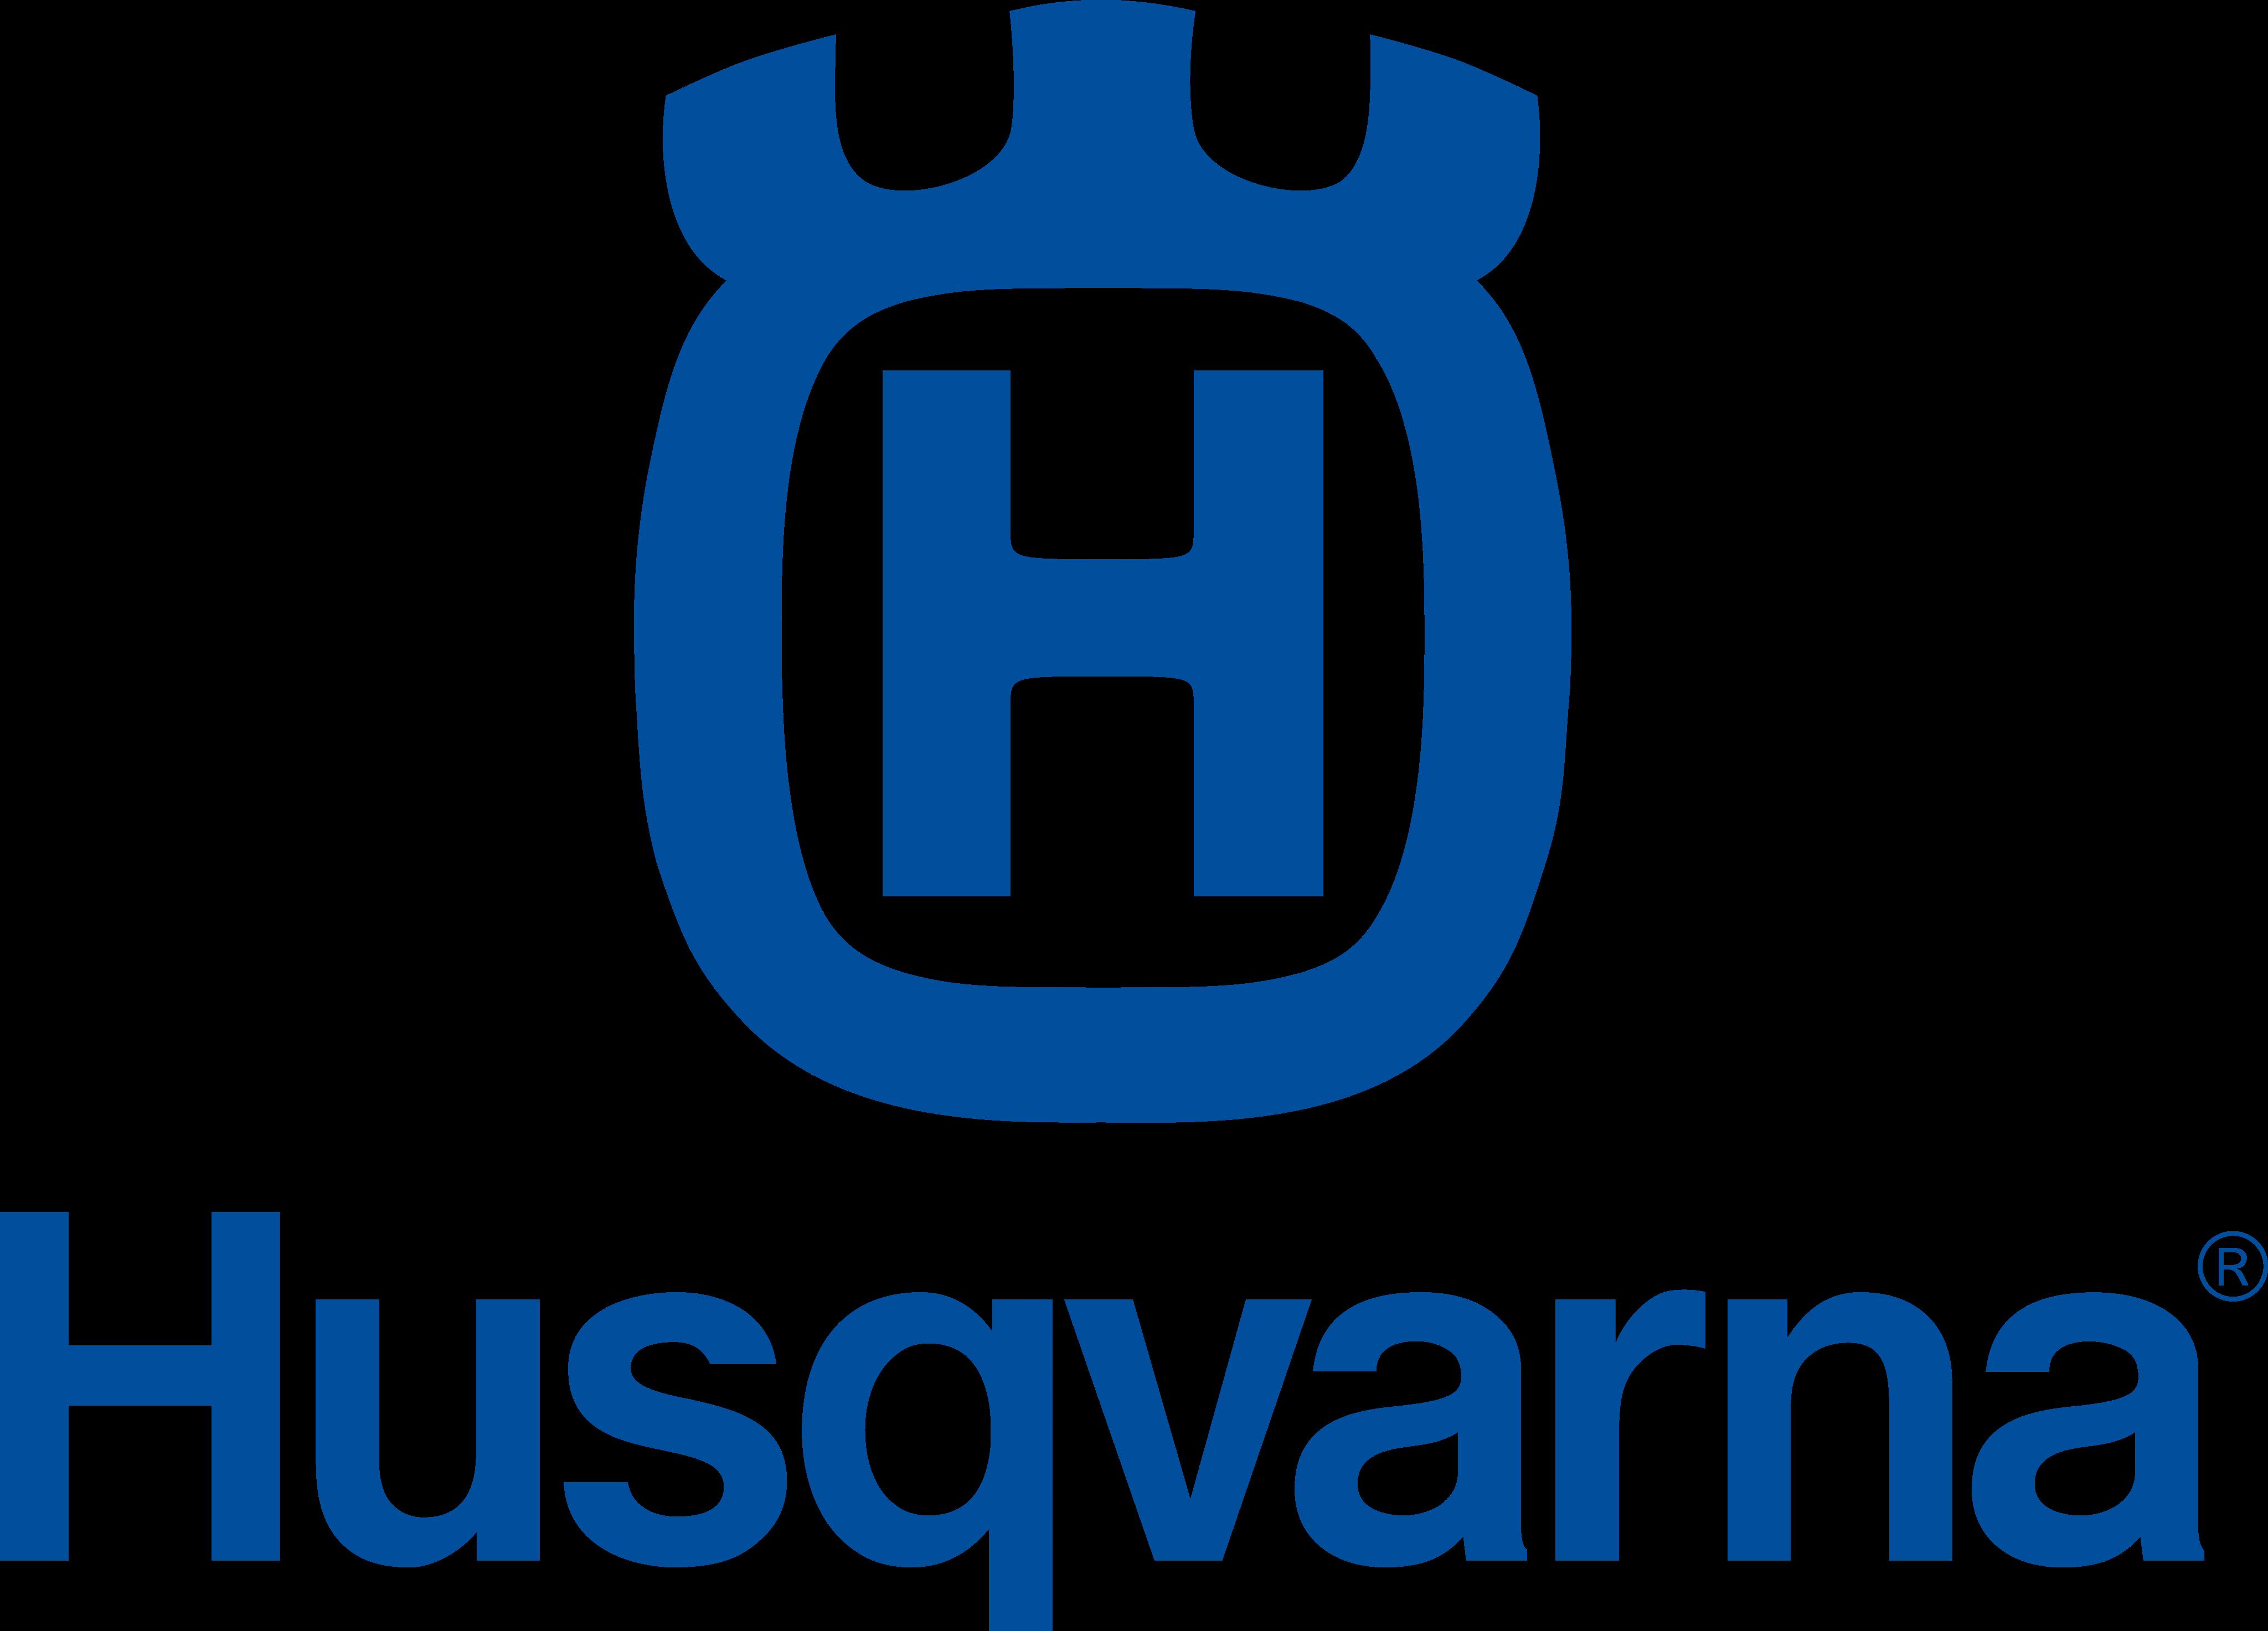 husqvarna logo 1 - Husqvarna Logo